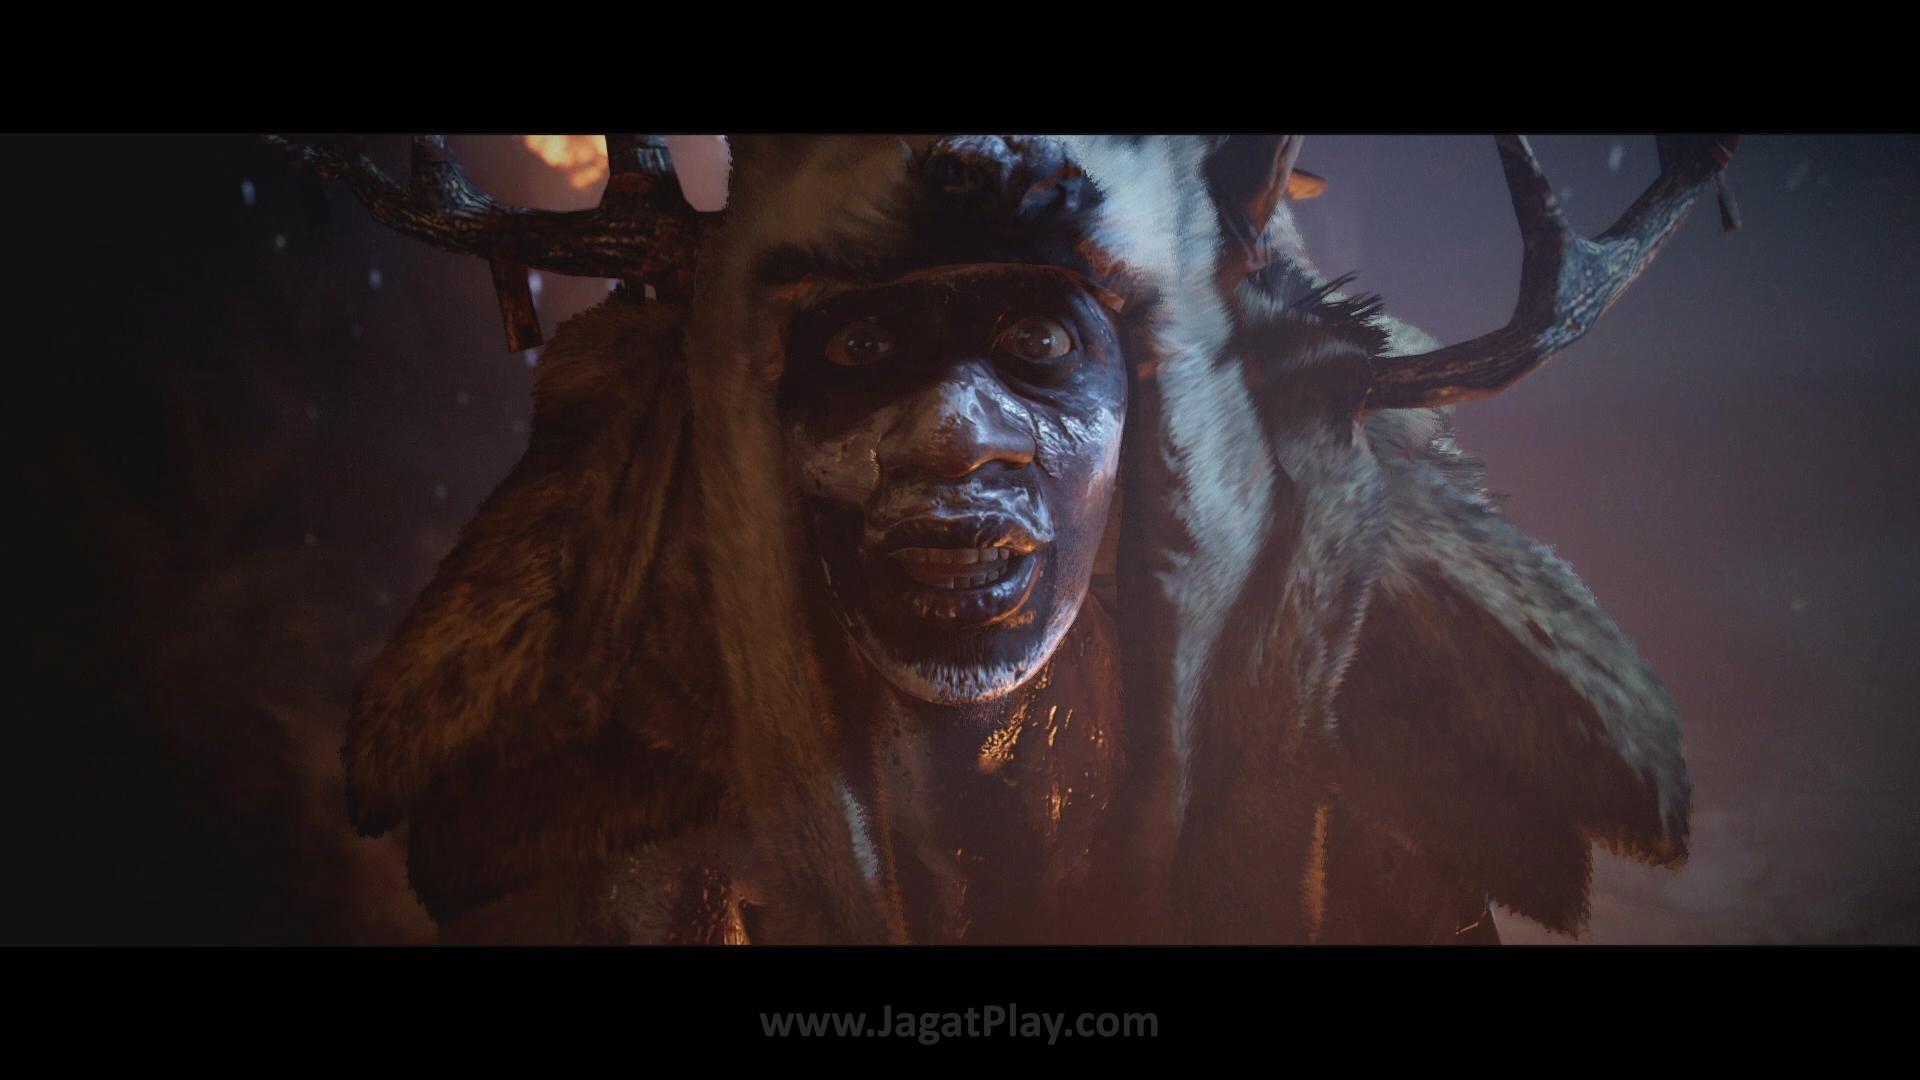 far cry primal story trailer 1